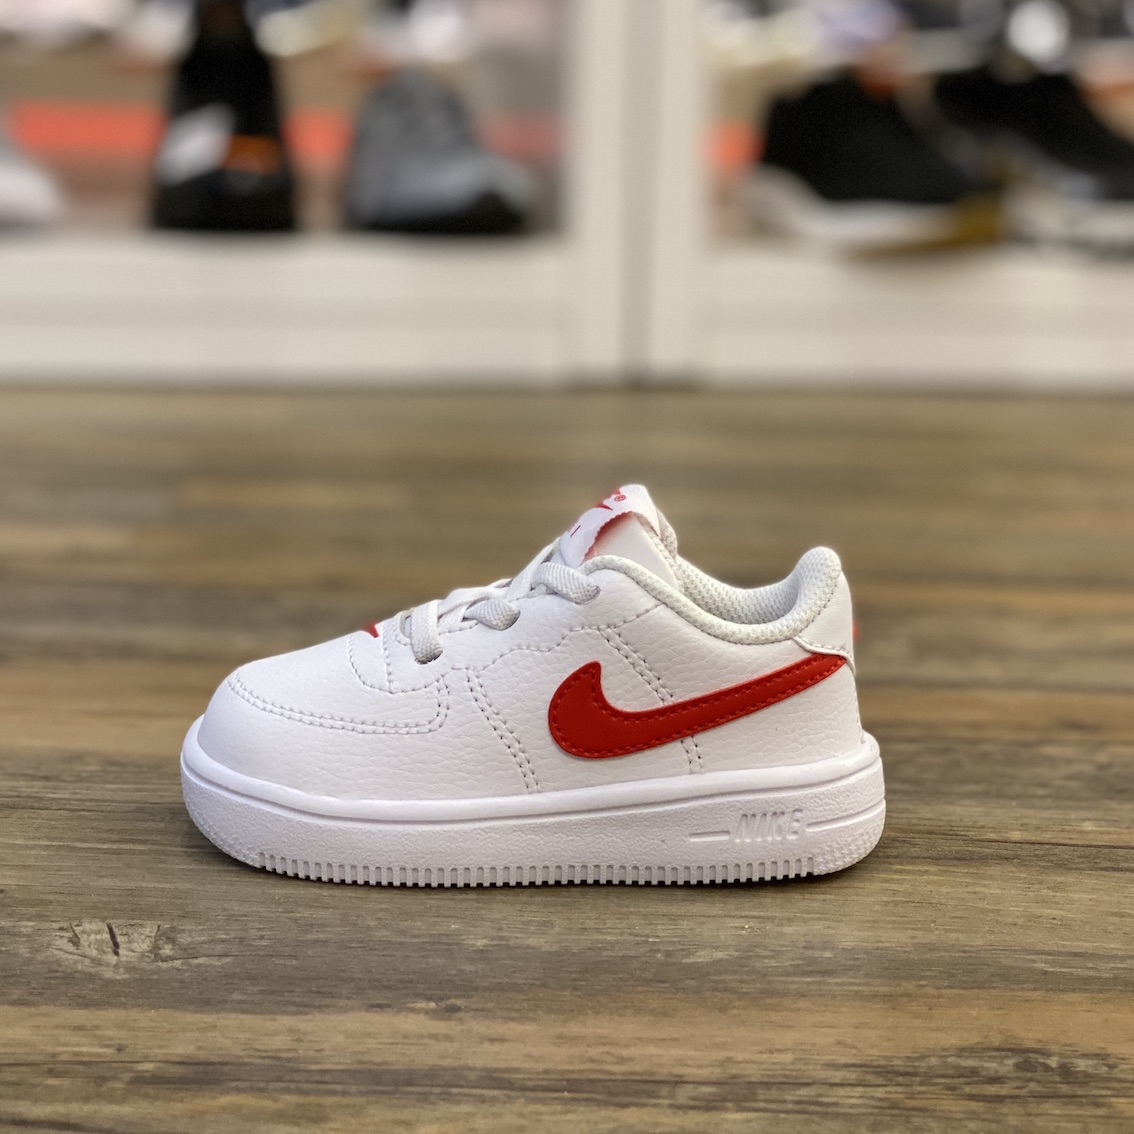 Nike Air Force 1 '18 TD Gr.27 Schuhe Sneaker weiß Jordan